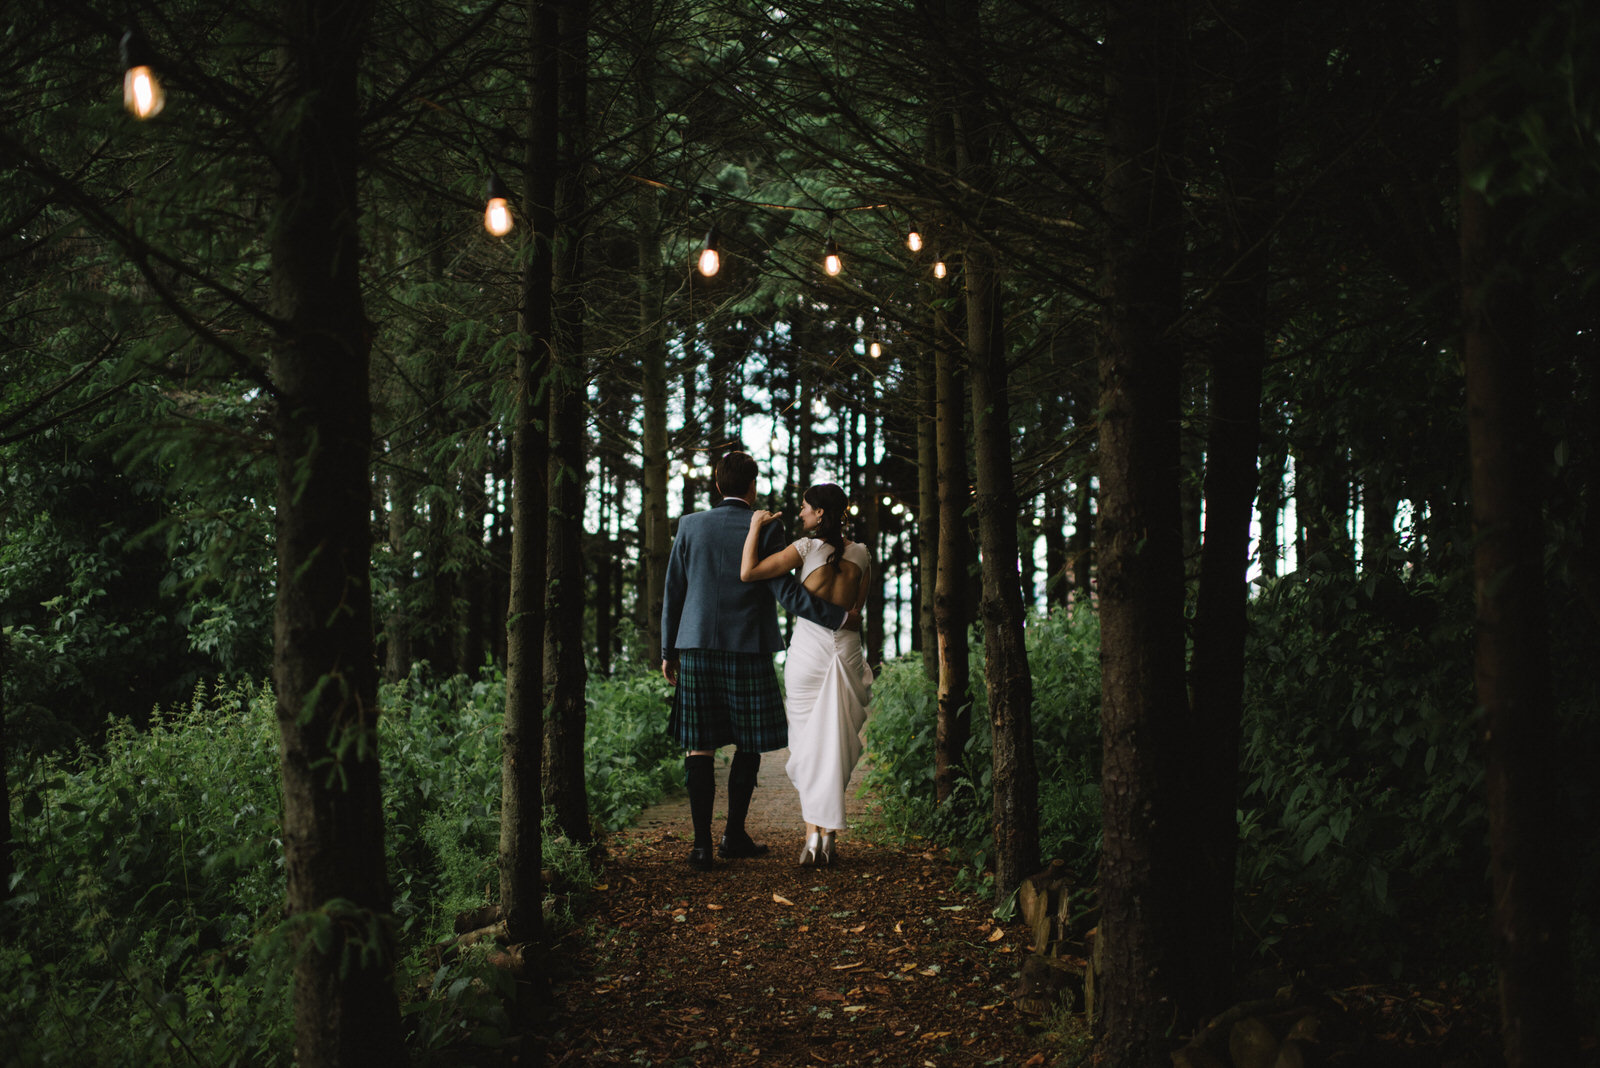 057-GUARDSWELL-FARM-WEDDING-ALTERNATIVE-SCOTTISH-WEDDING-PHOTOGRAPHER-SCOTTISH-WEDDING-DESTINATION-WEDDING-PHOTOGRAPHER.JPG